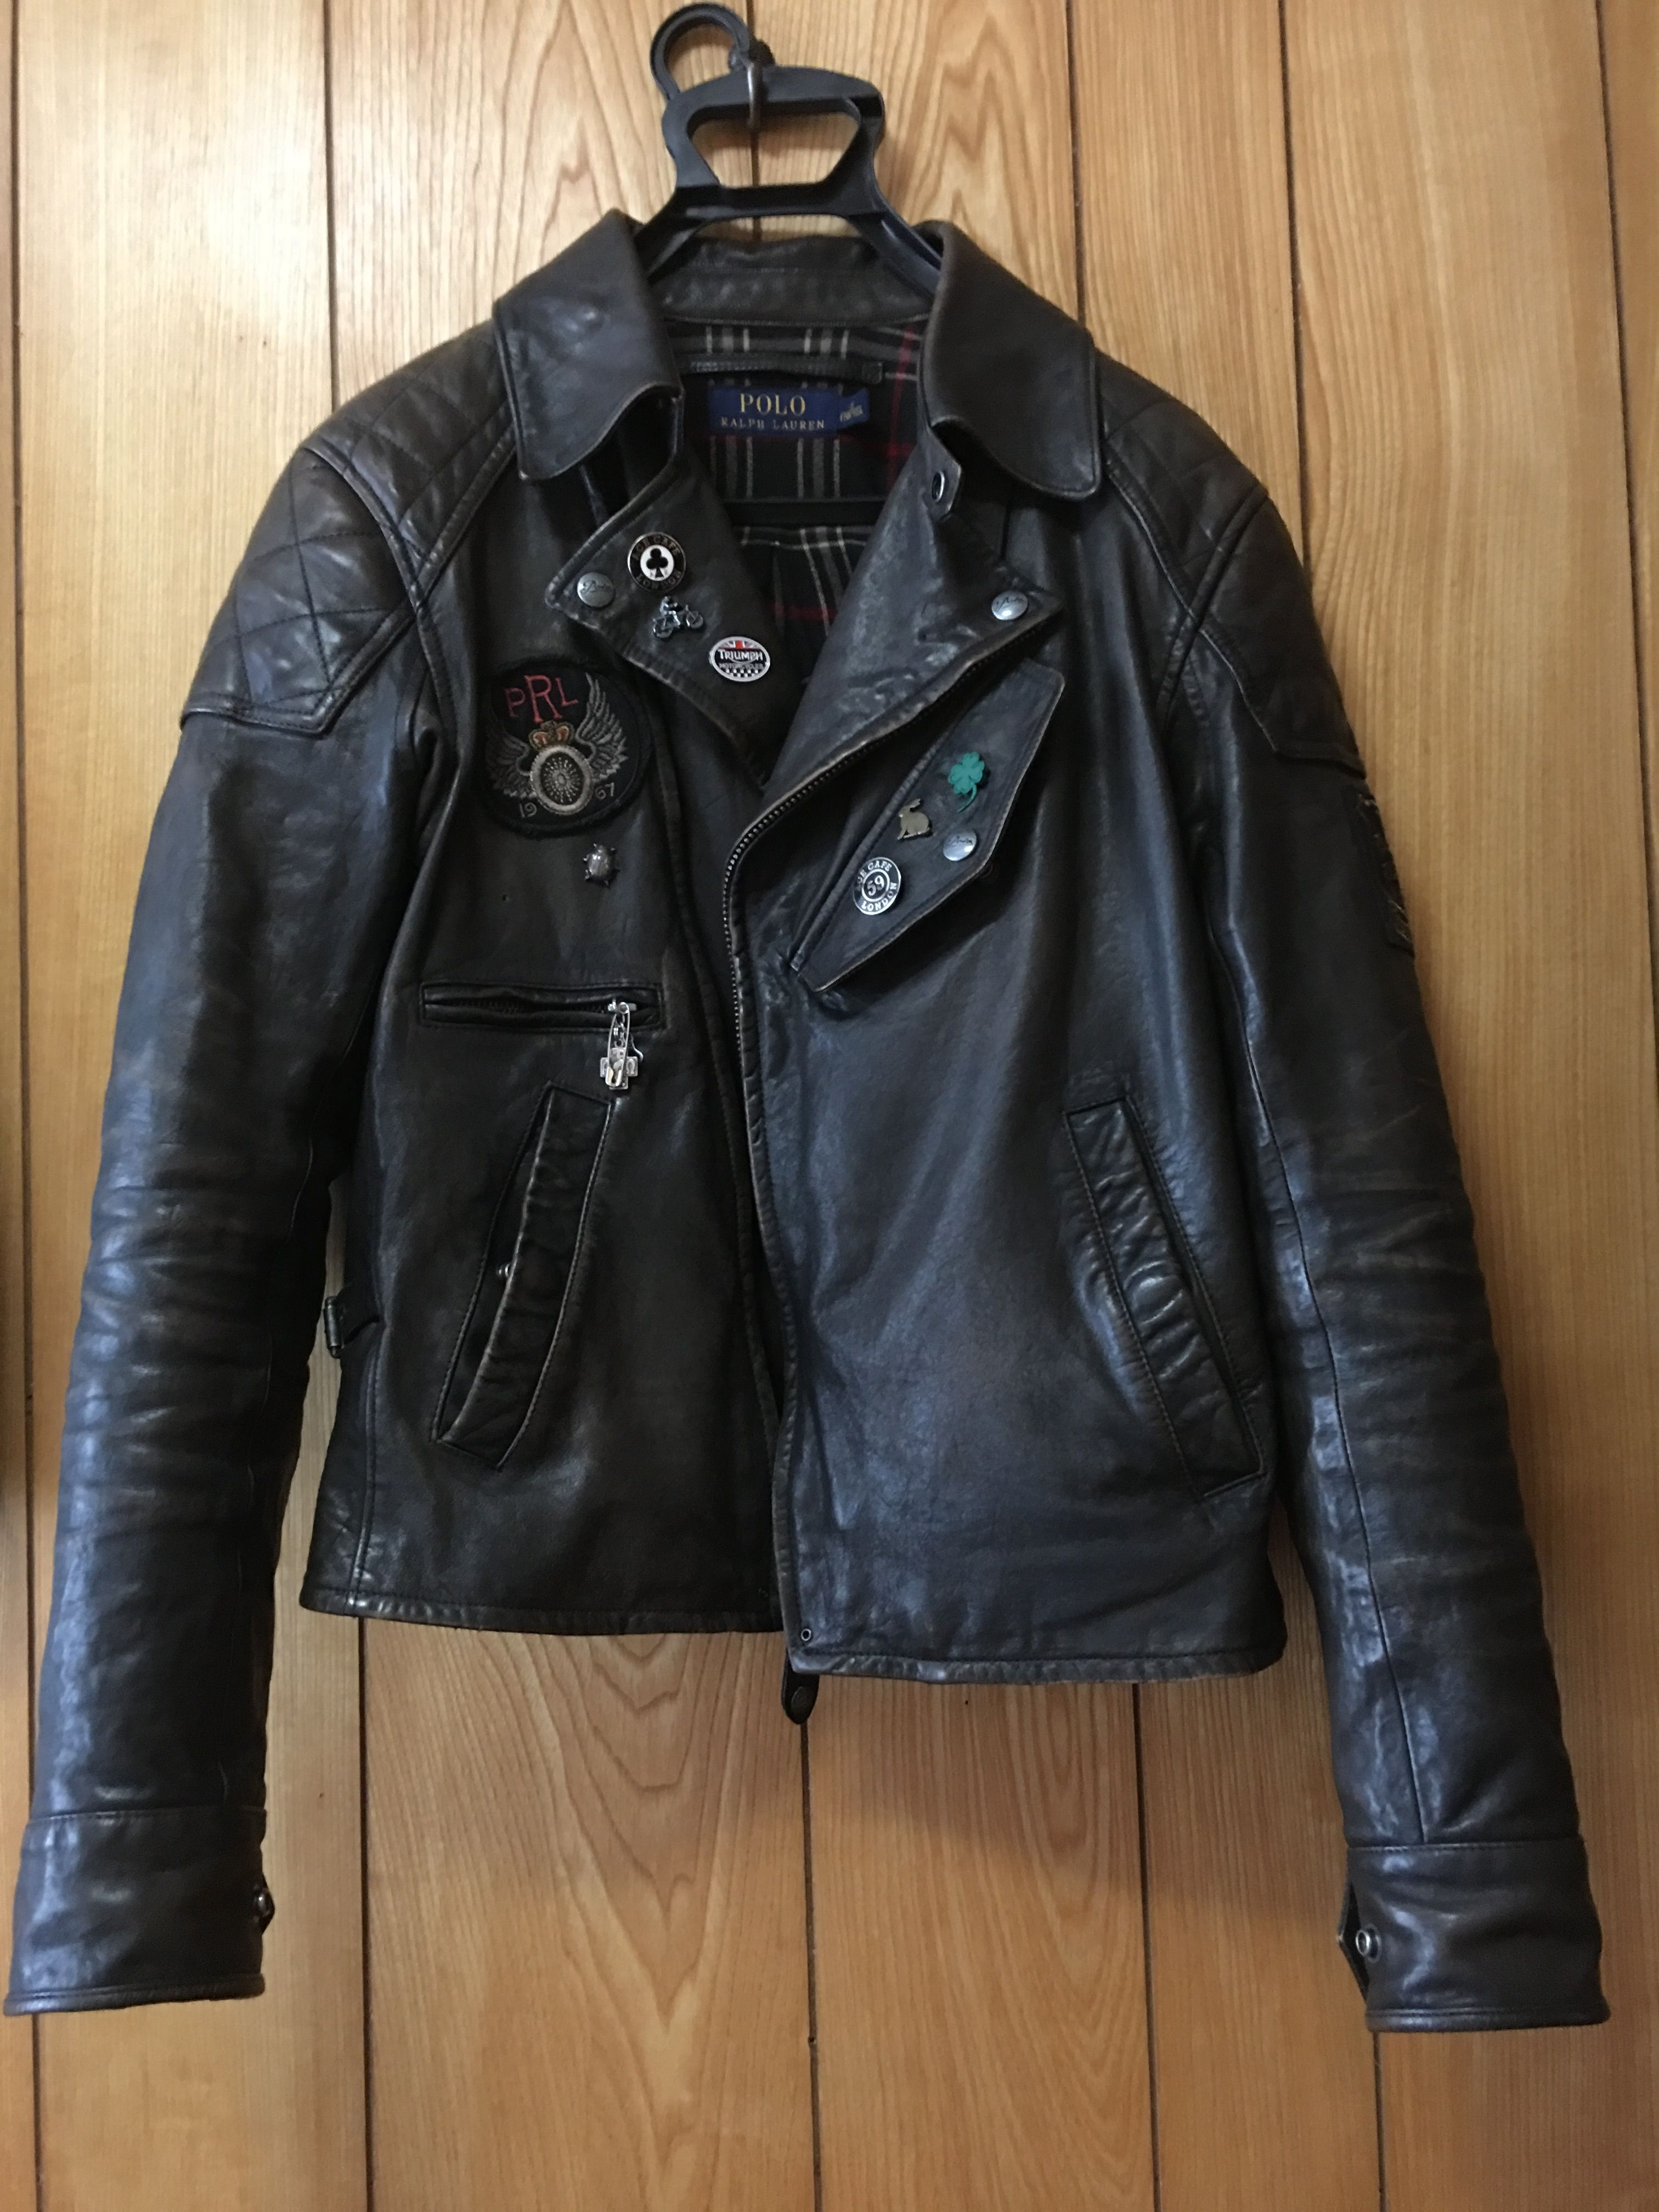 305138e6 Ralph Lauren motorcycle jacket. Photo by David Hunter. | Jacket in ...